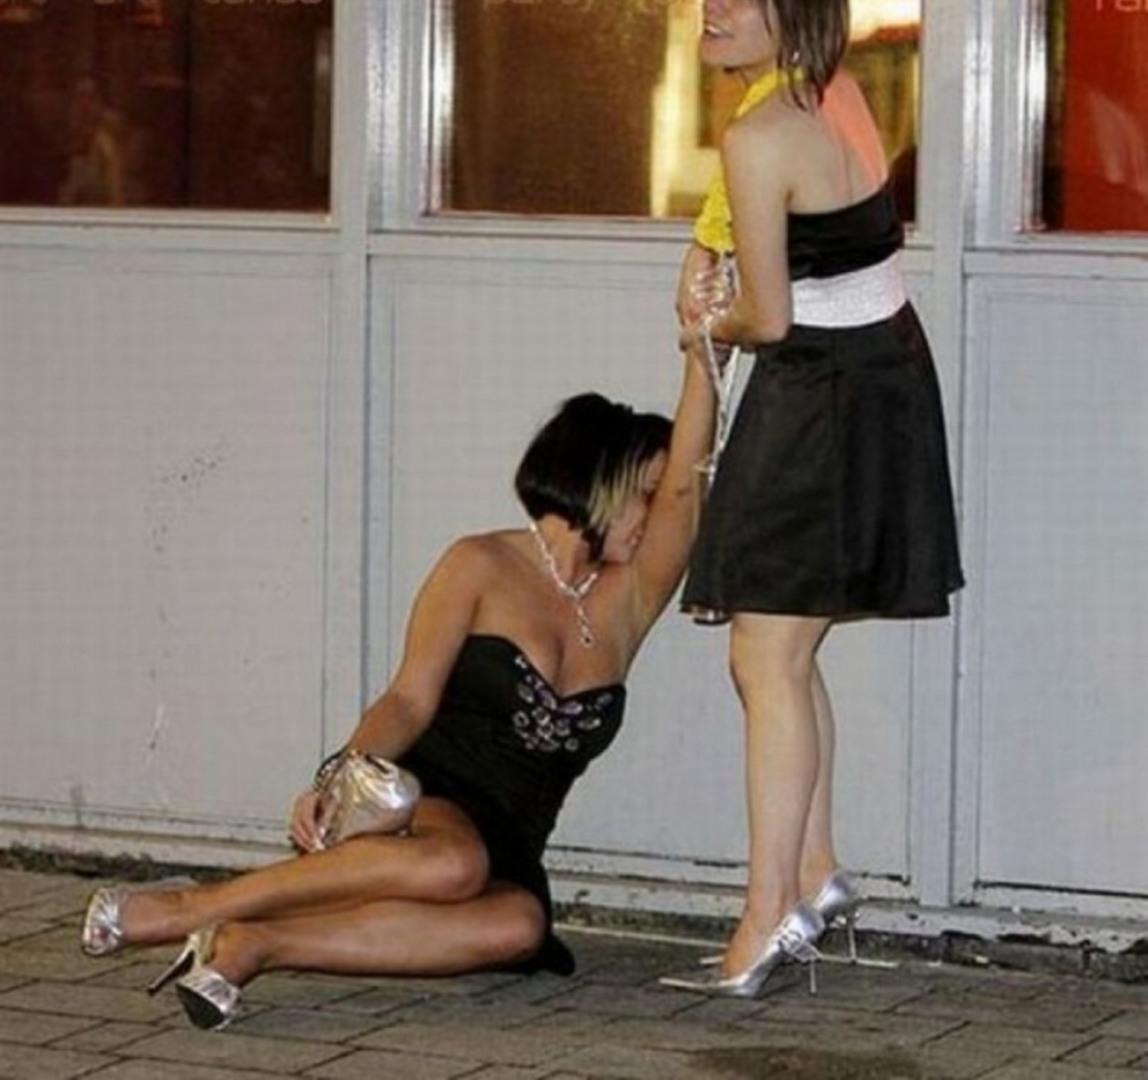 Пьянство никого до добра не доводило